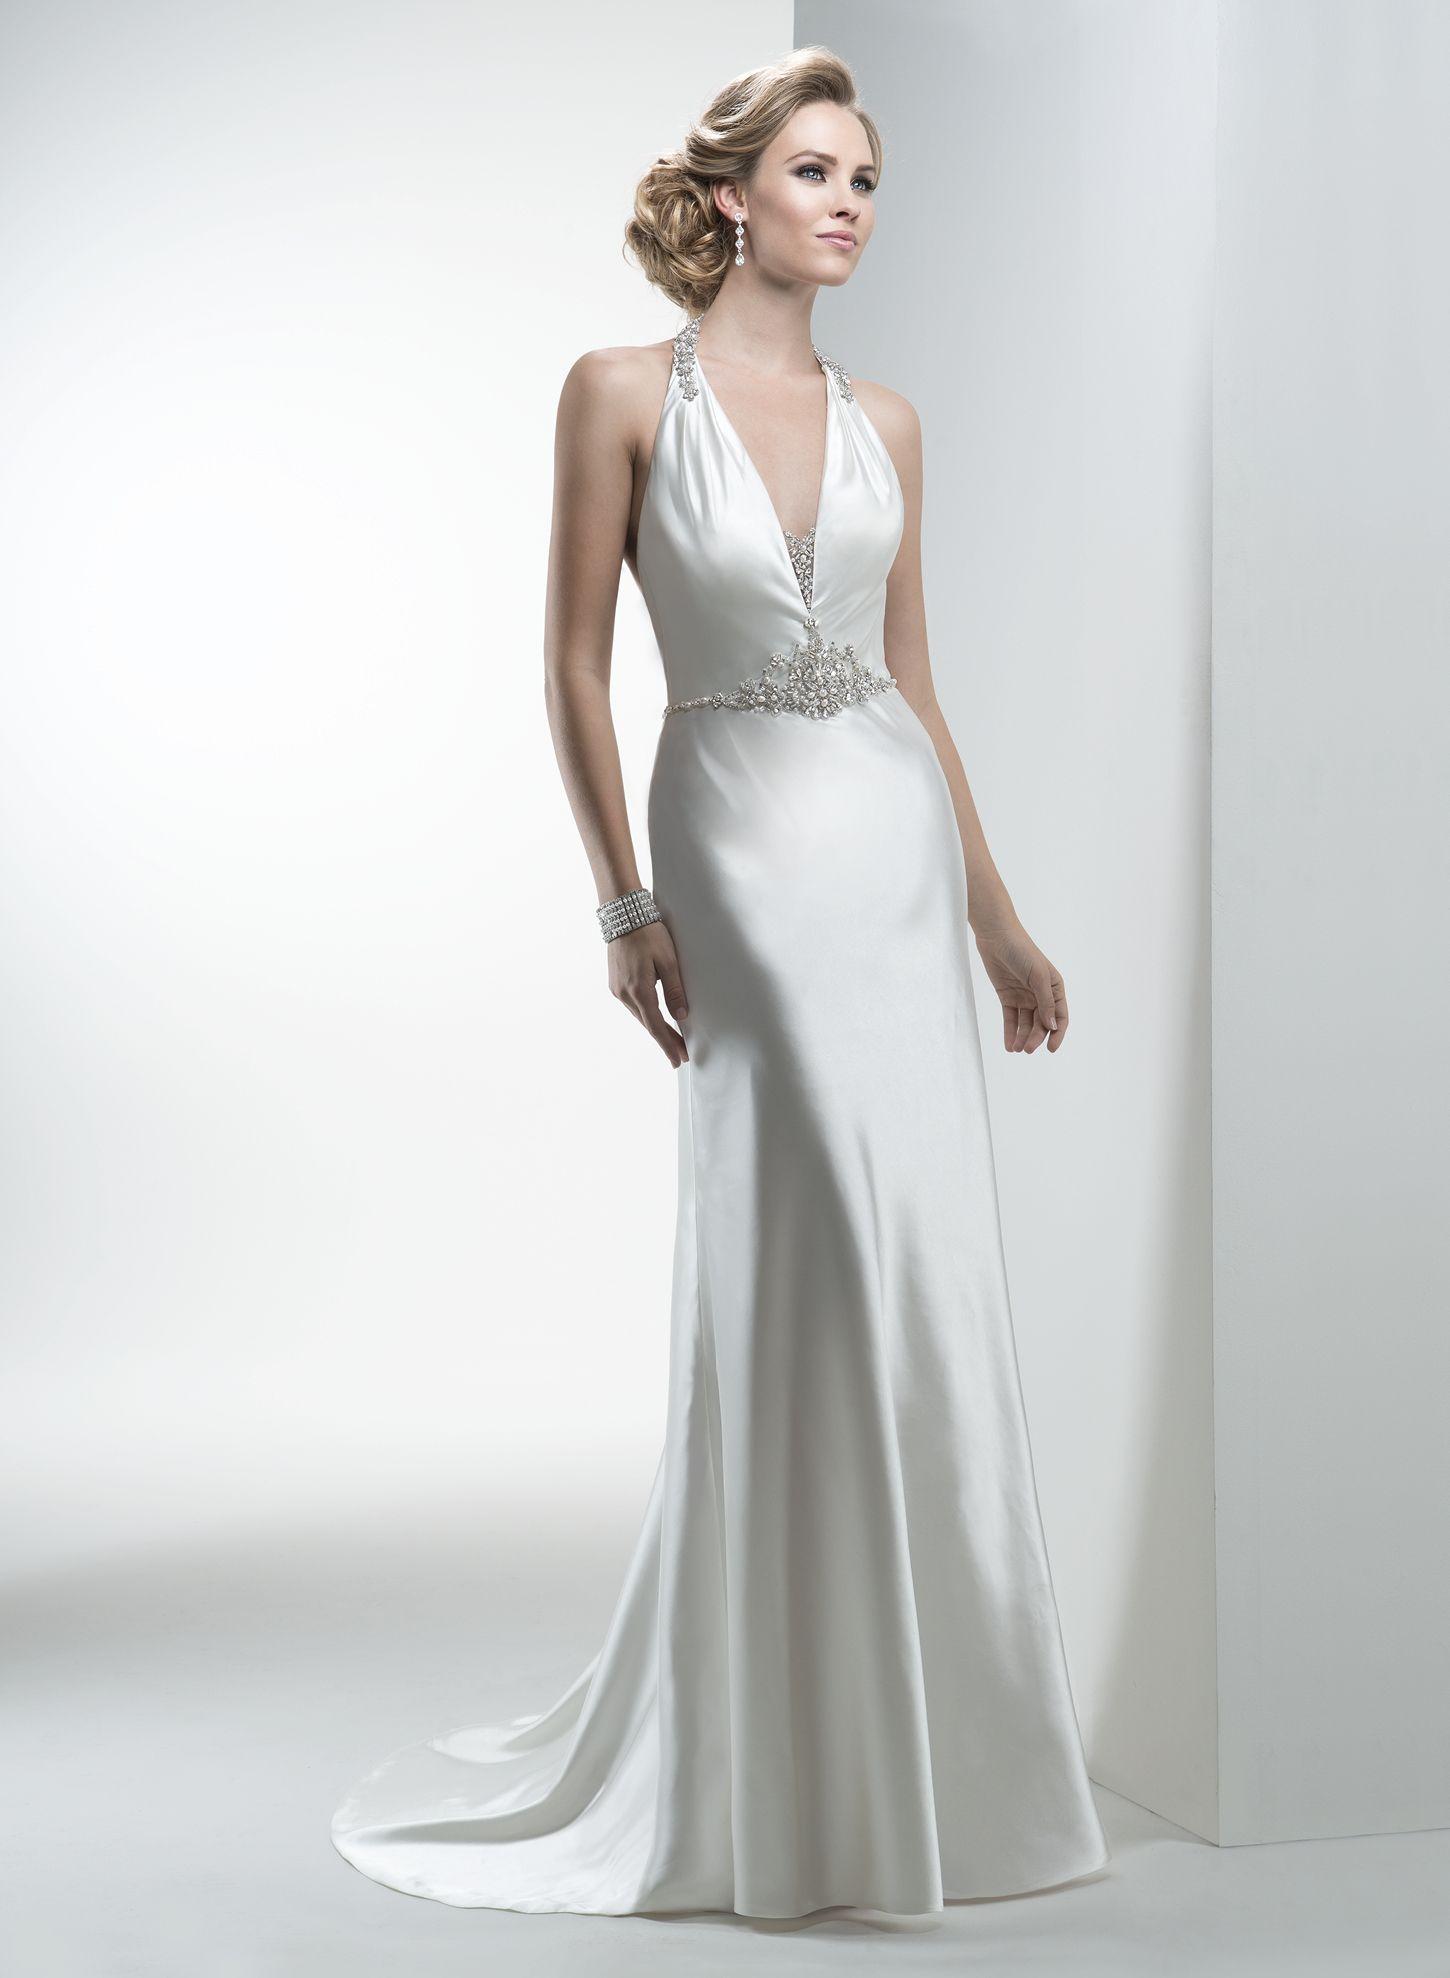 Vintage cowl neck wedding dress  Maggie Sottero Wedding Dresses  Maggie sottero and By